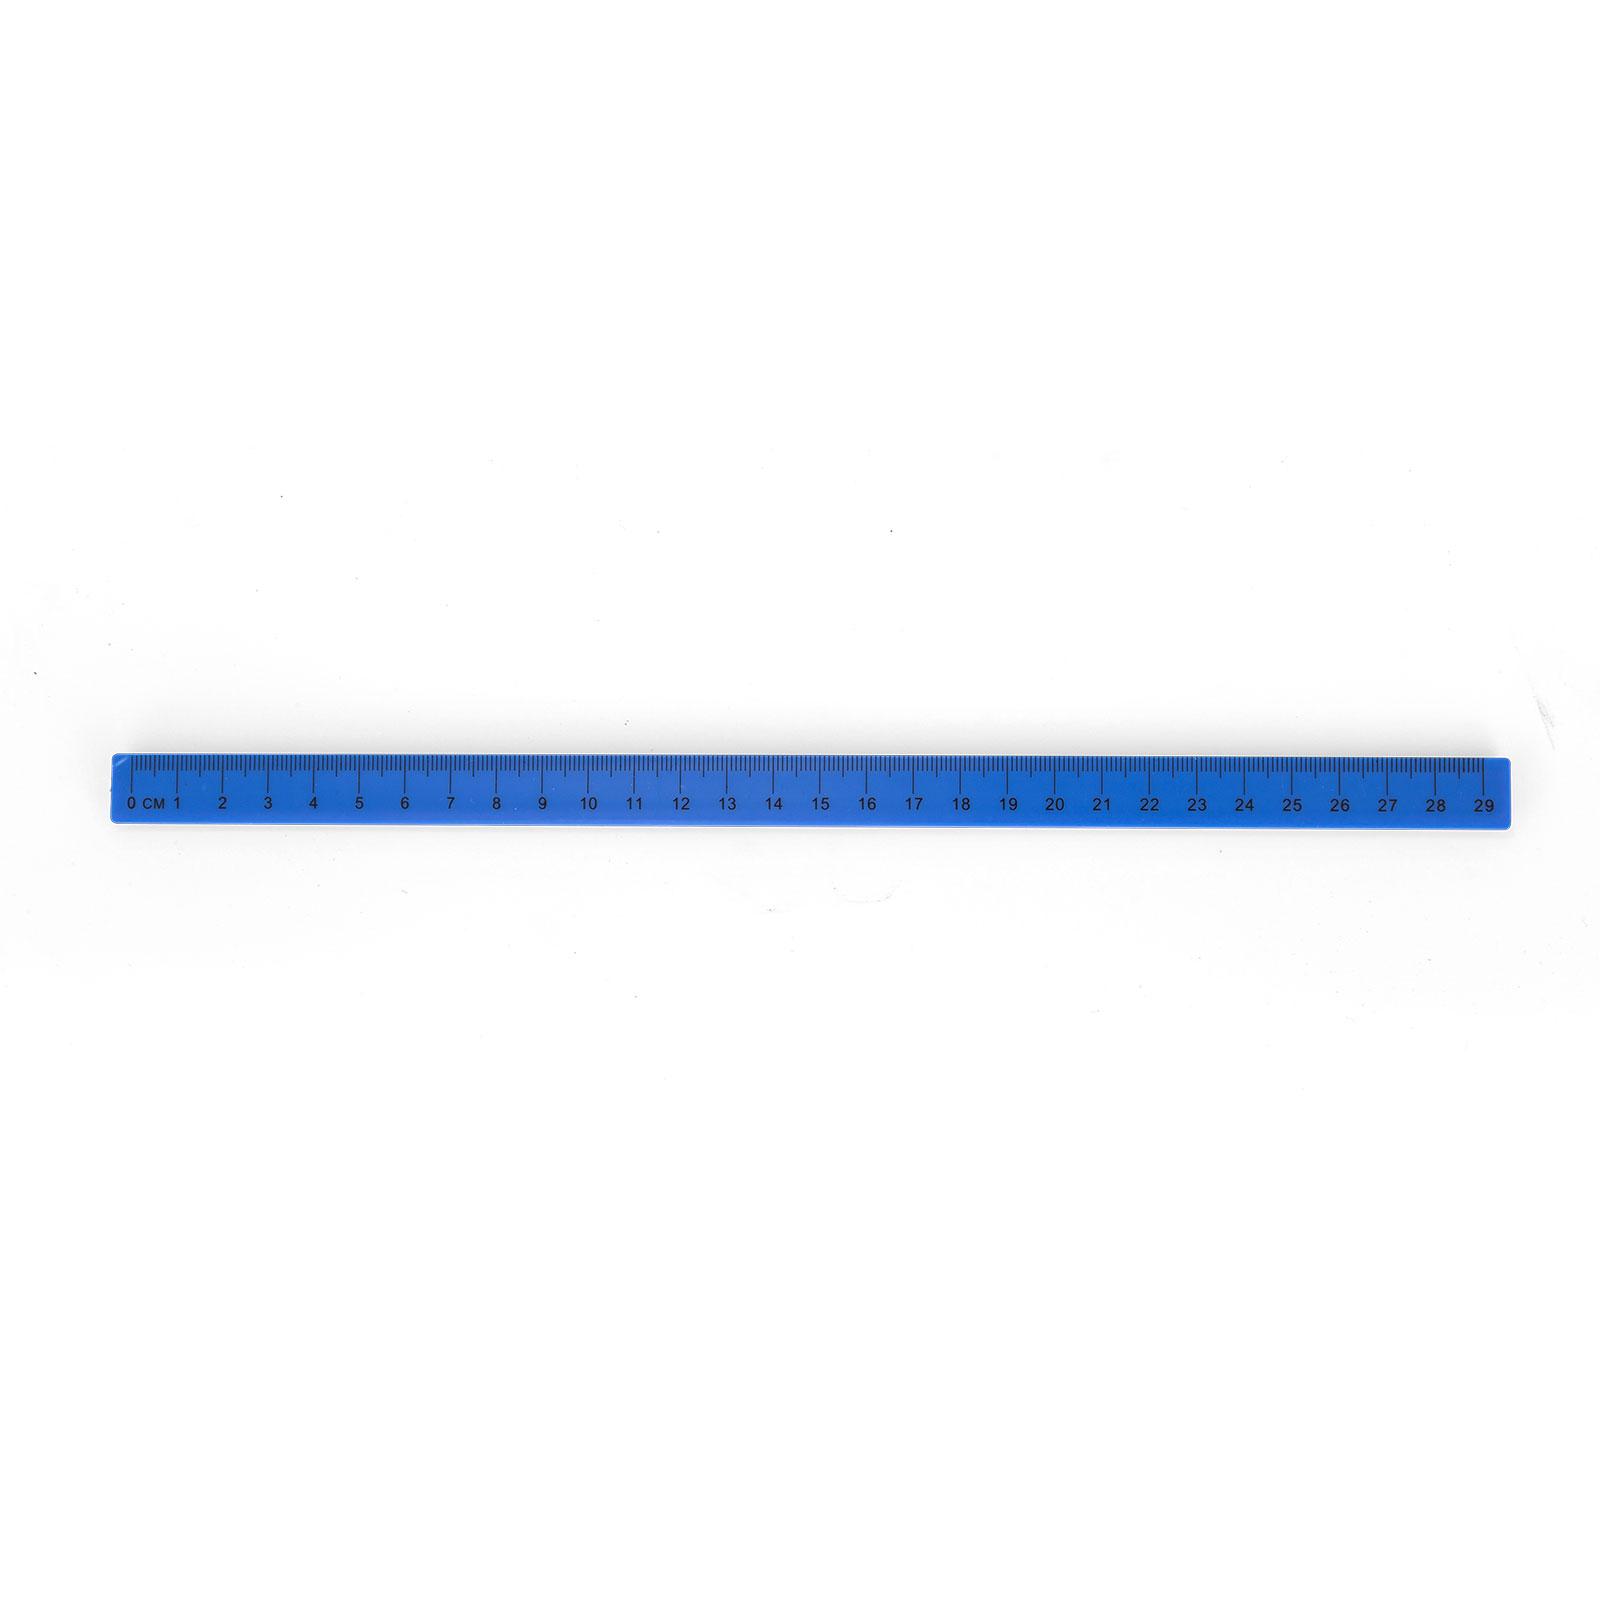 Cordonatrice-Perforatrice-Max-350-520mm-Profondita-Regolabile-Elettrica-Manuale miniatura 59